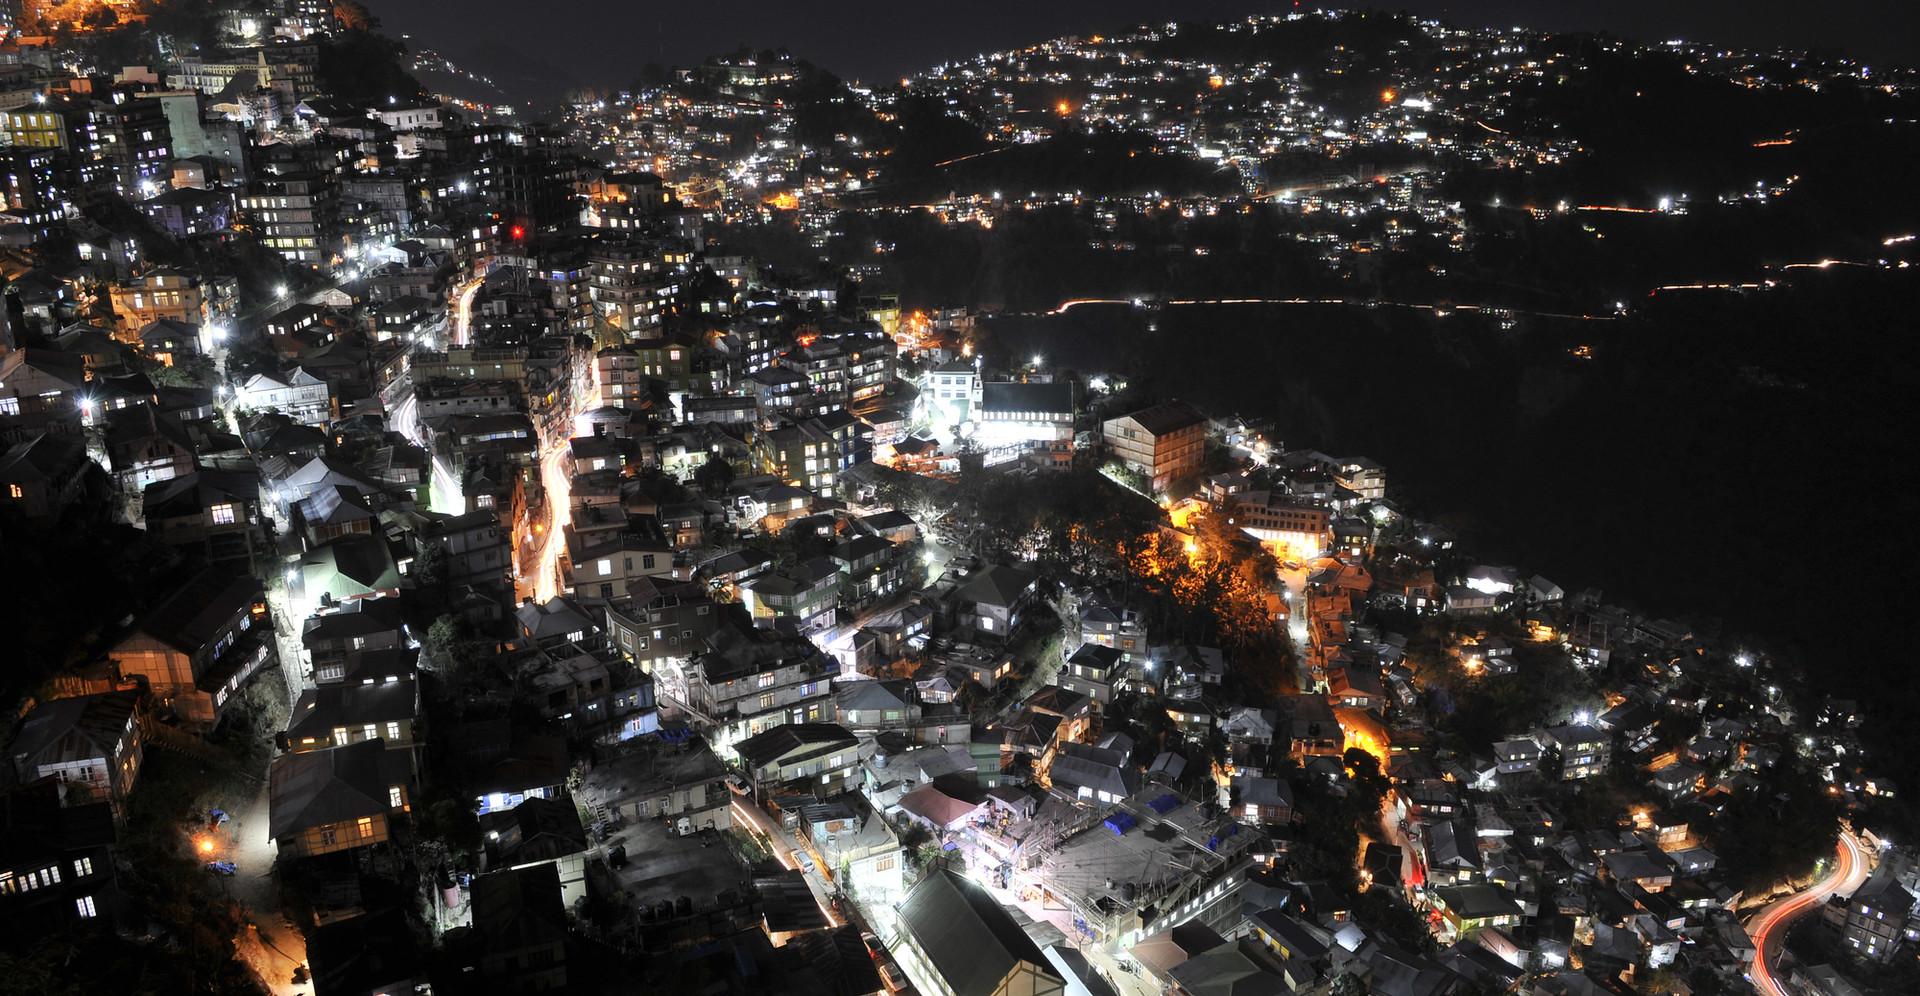 Night View - Aizawl